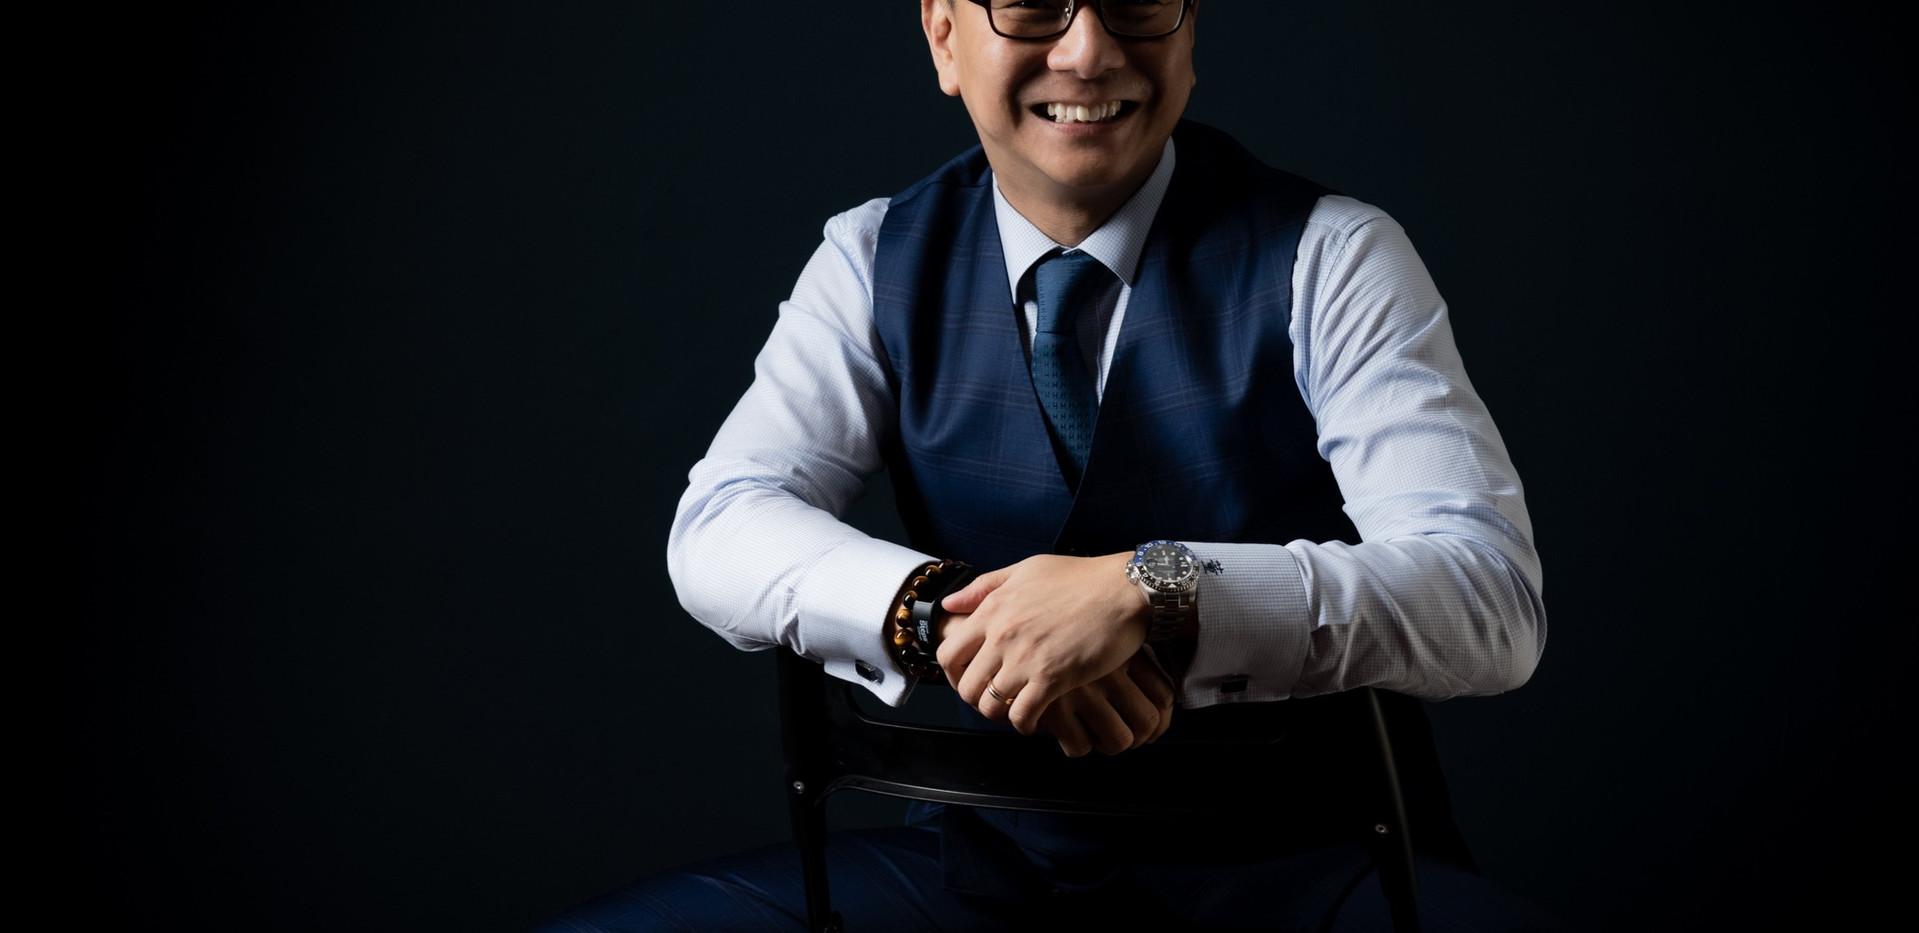 David Tang, Director